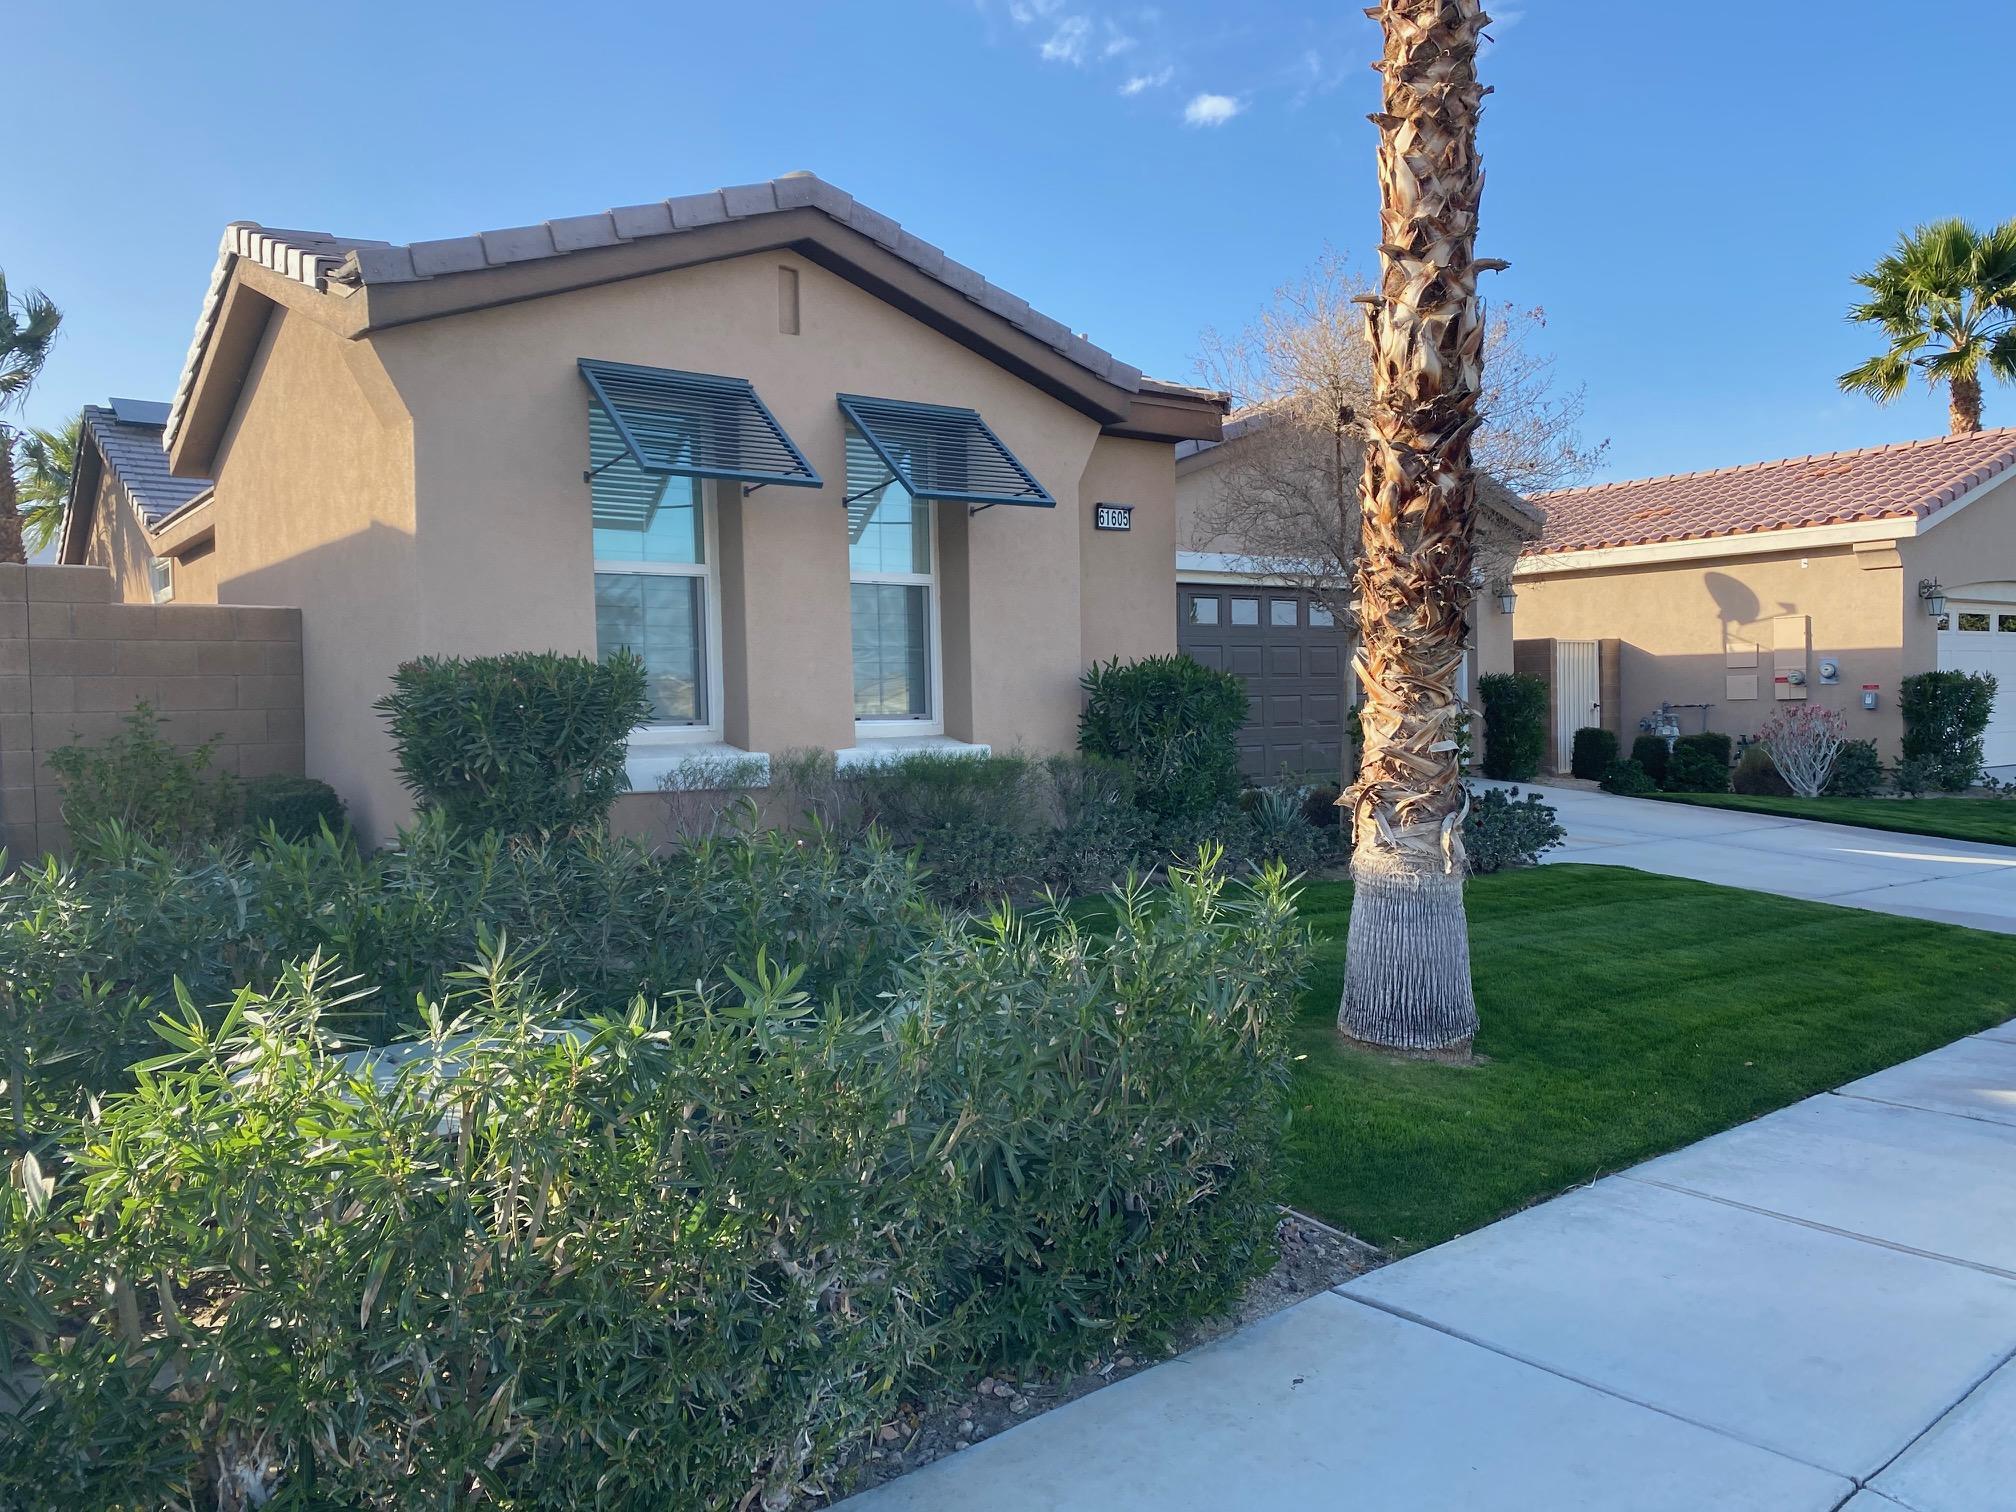 Photo of 61605 Living Stone Drive, La Quinta, CA 92253